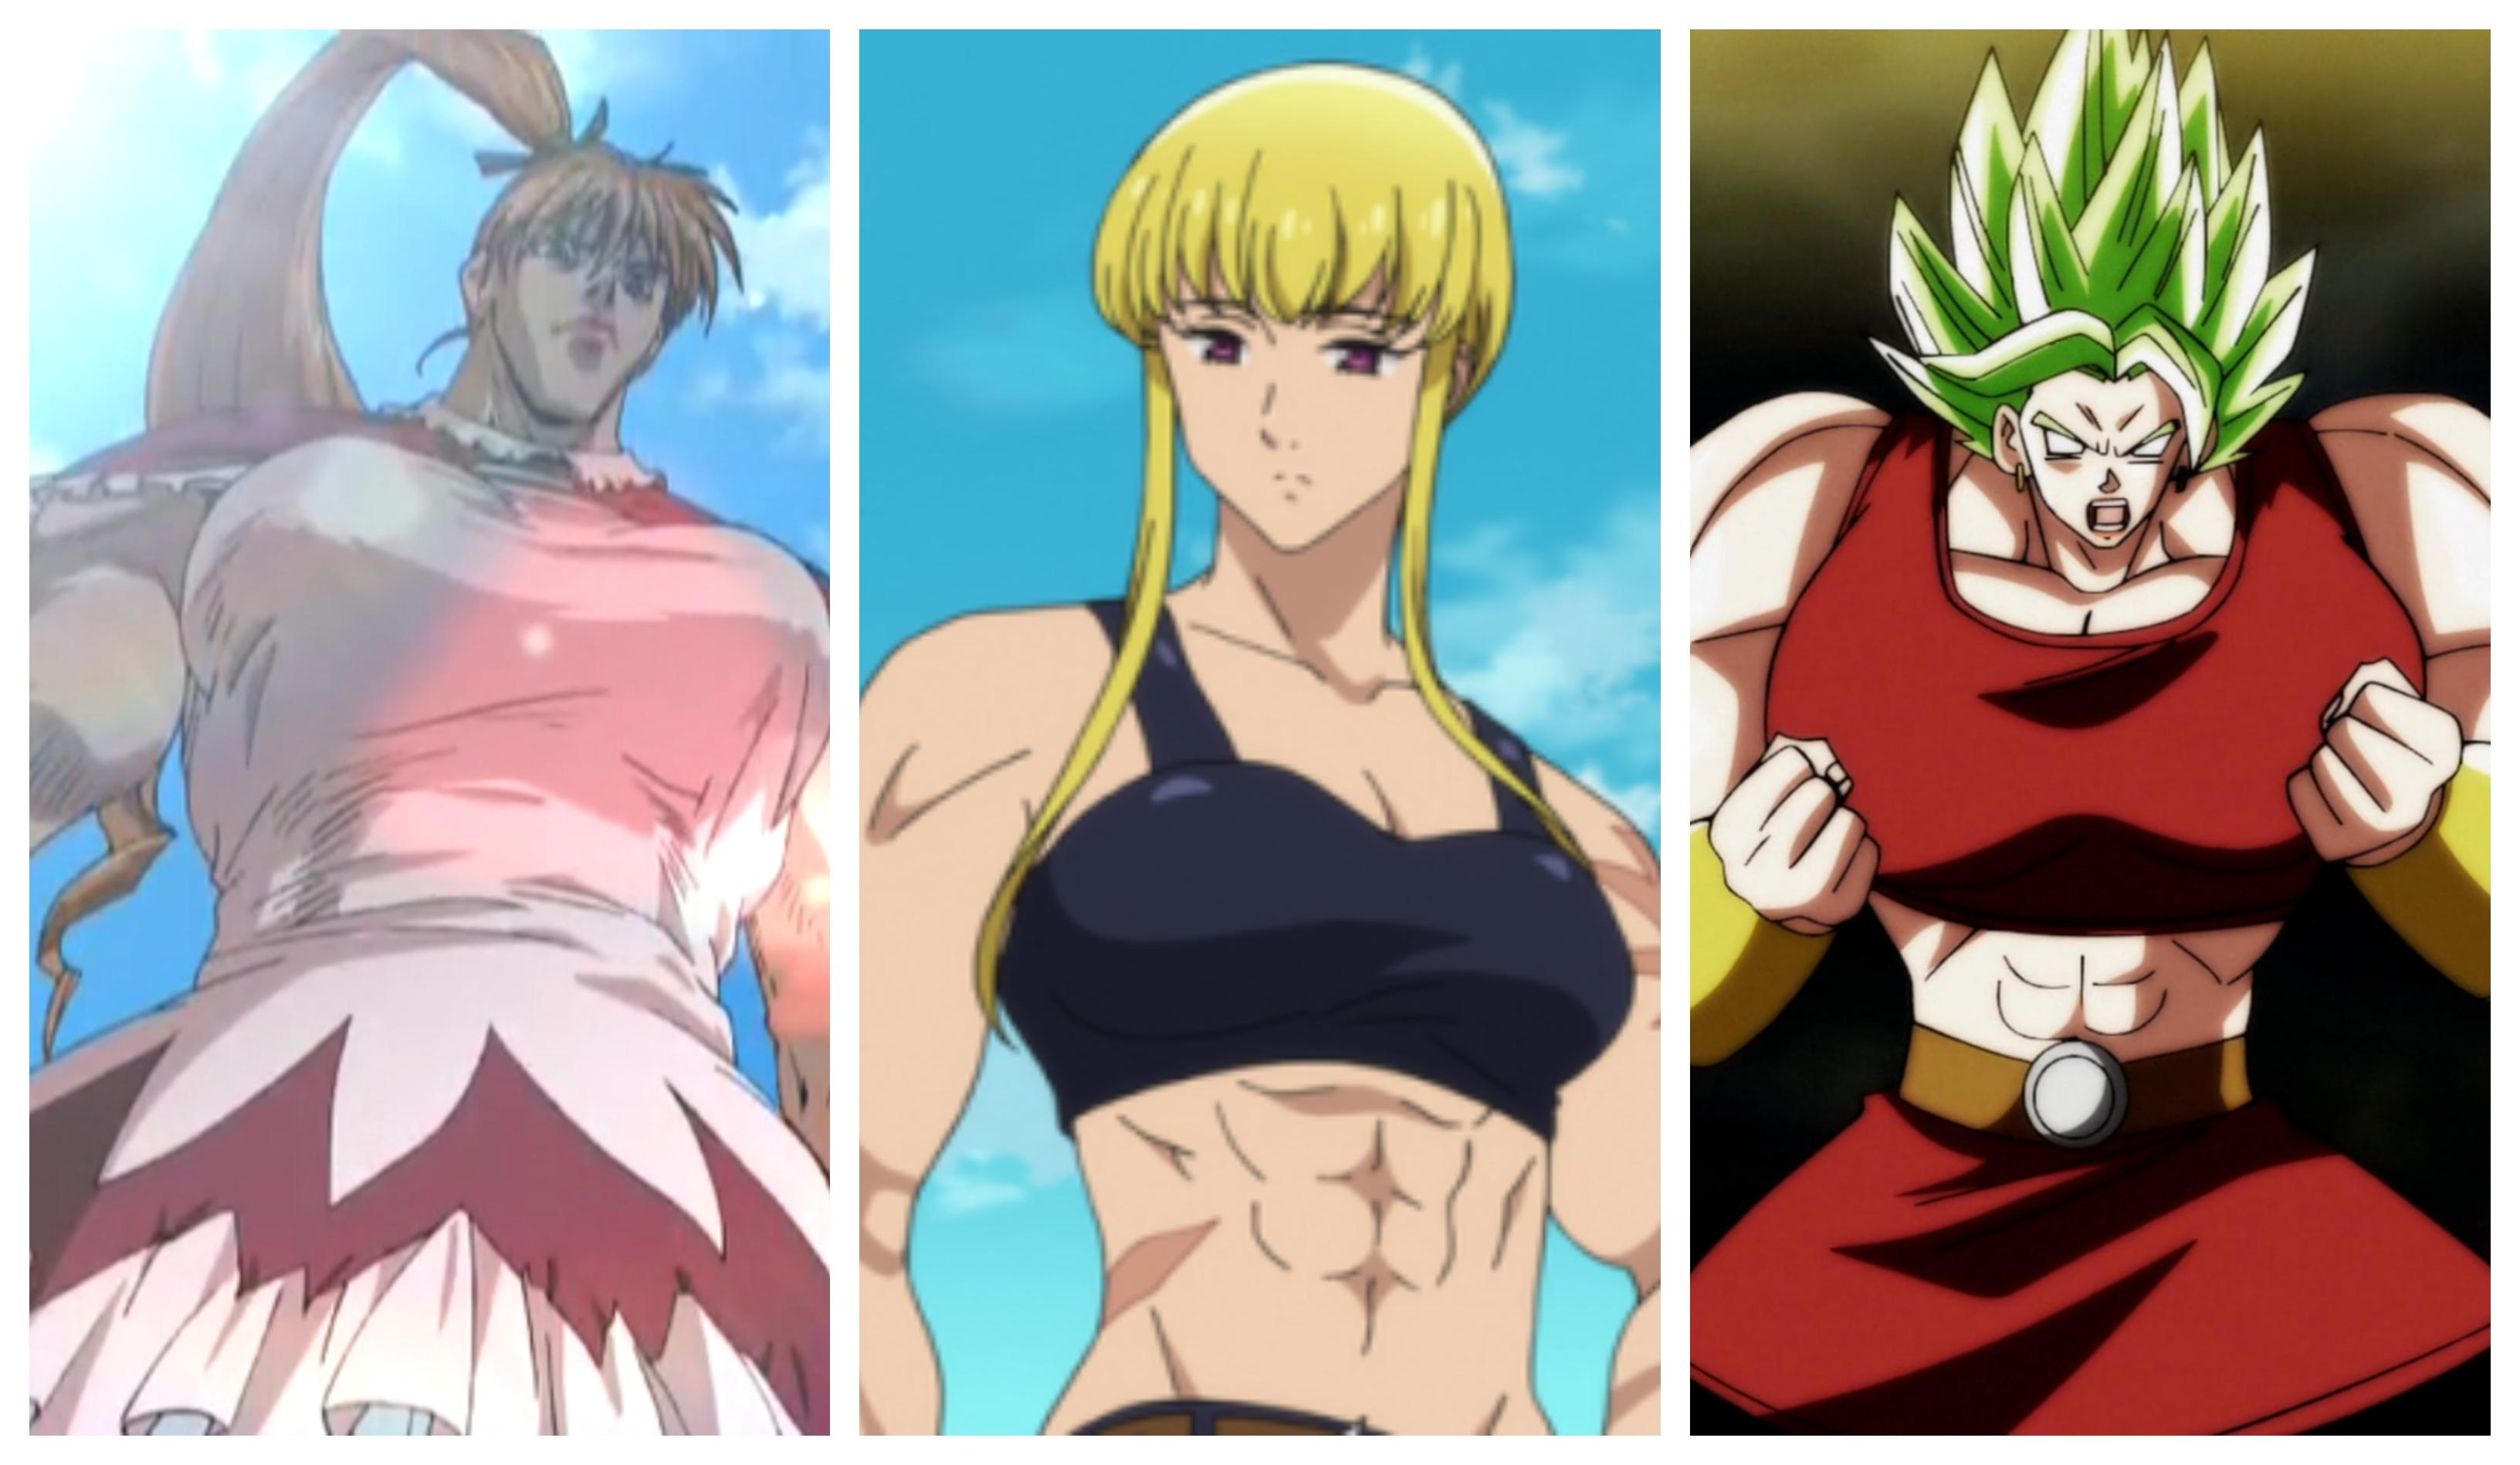 muscular anime girls